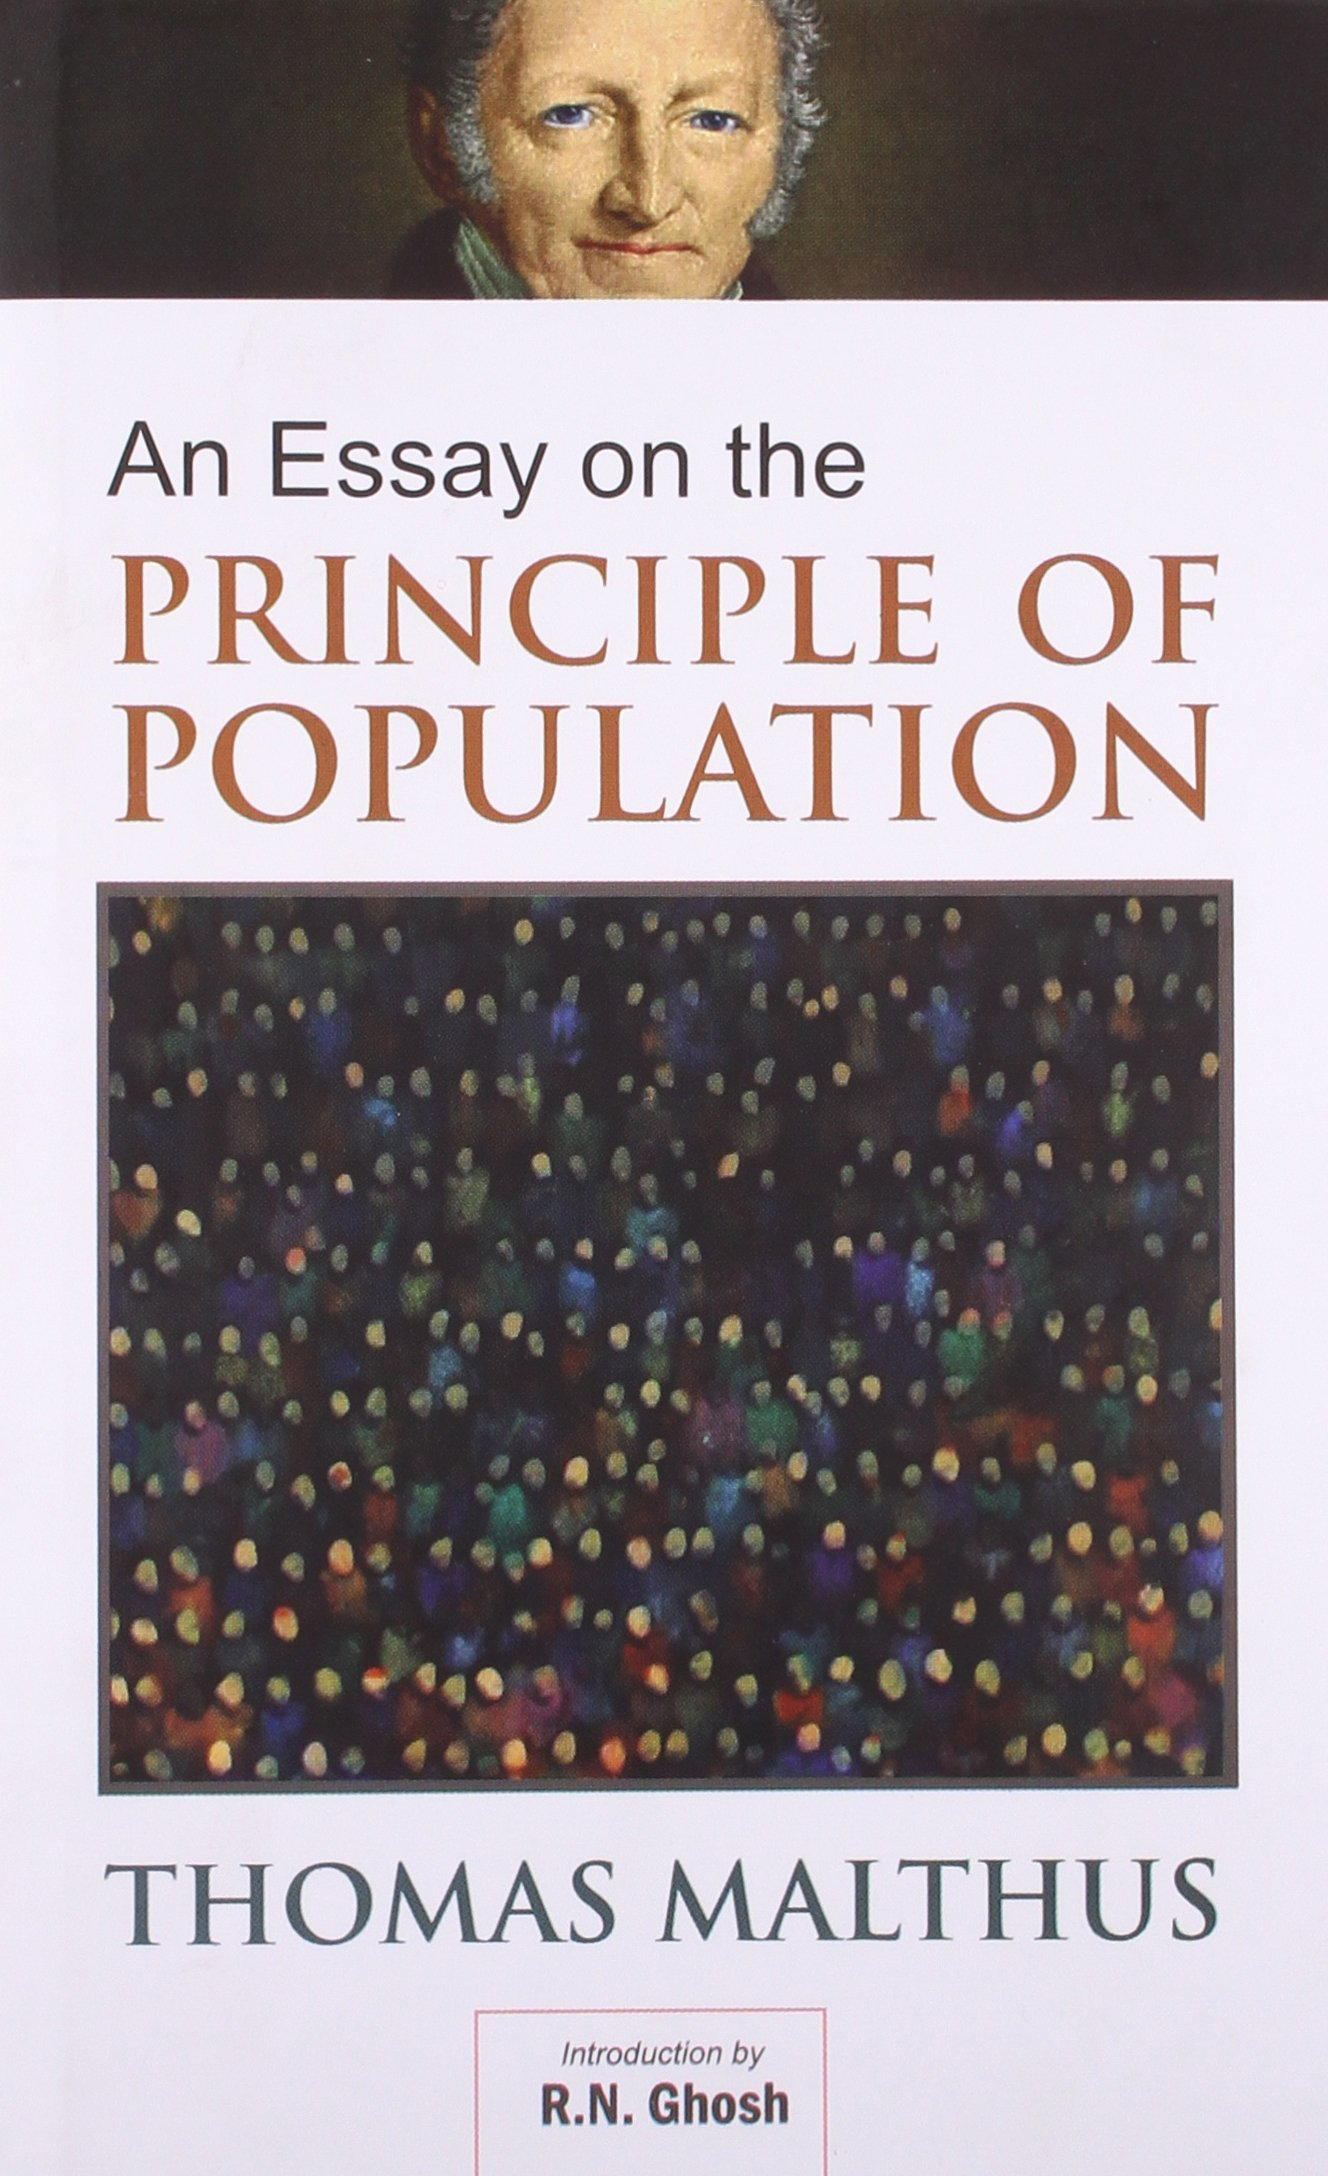 010 Thomas Malthus Essay On The Principle Of Population 8162bfm1ycfl Stupendous After Reading Malthus's Principles Darwin Got Idea That Ap Euro Full